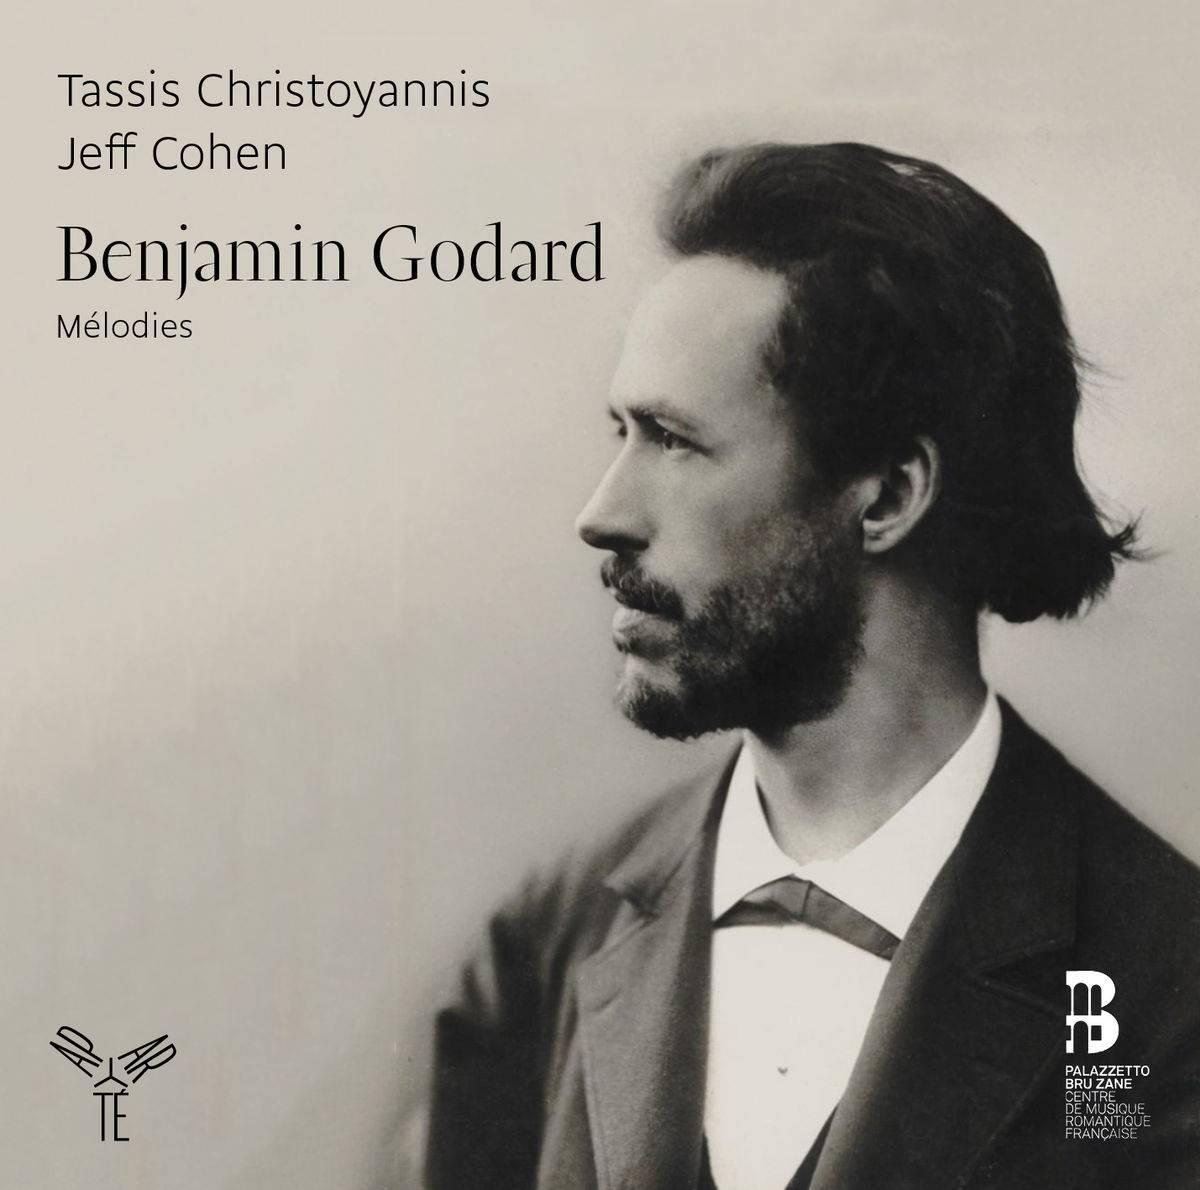 Tassis Christoyannis & Jeff Cohen - Benjamin Godard: Mélodies (2016) [Official Digital Download 24/96]